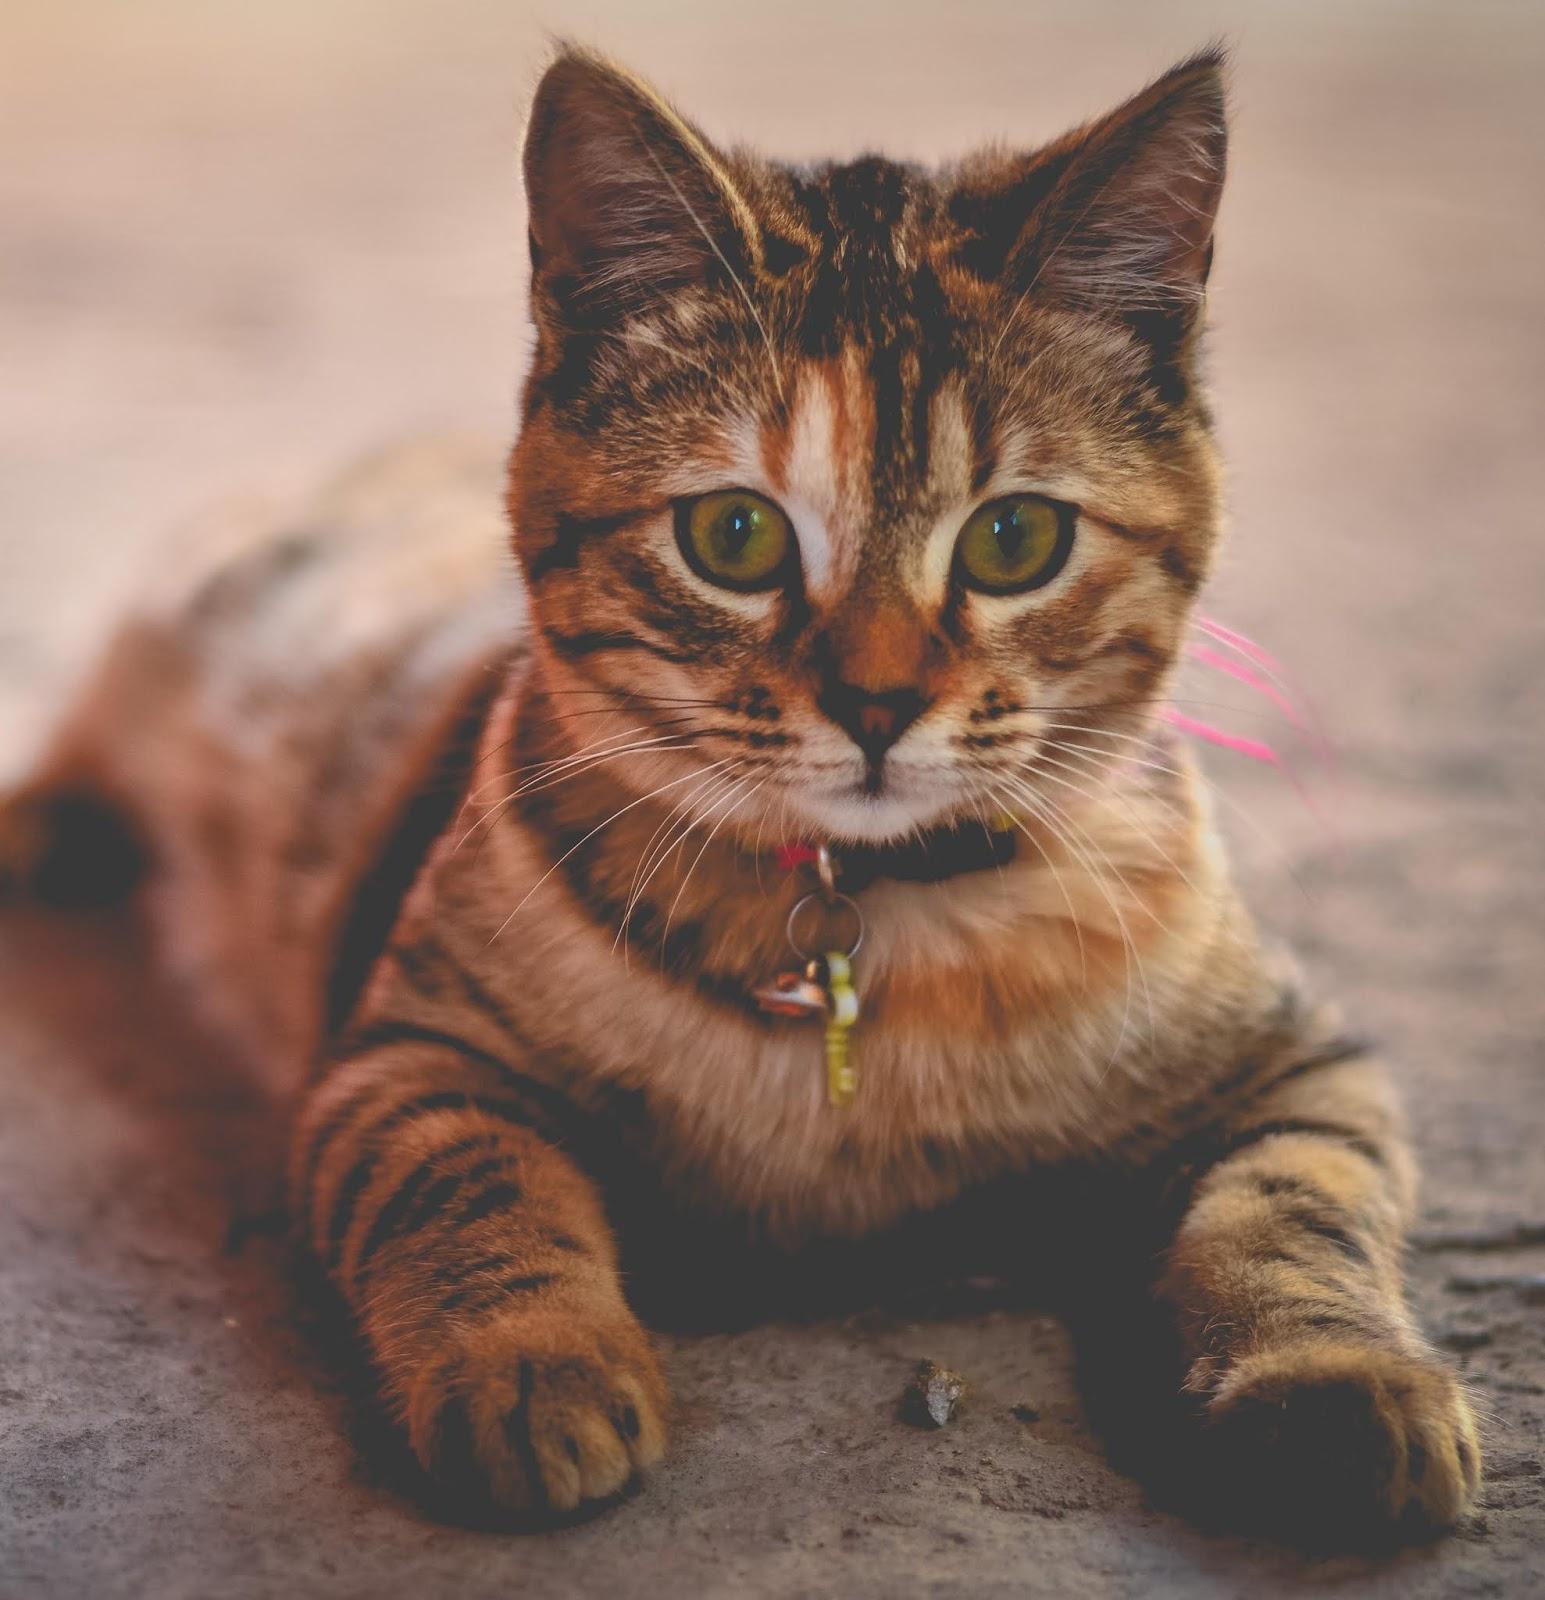 Beautiful Cats dp 2019